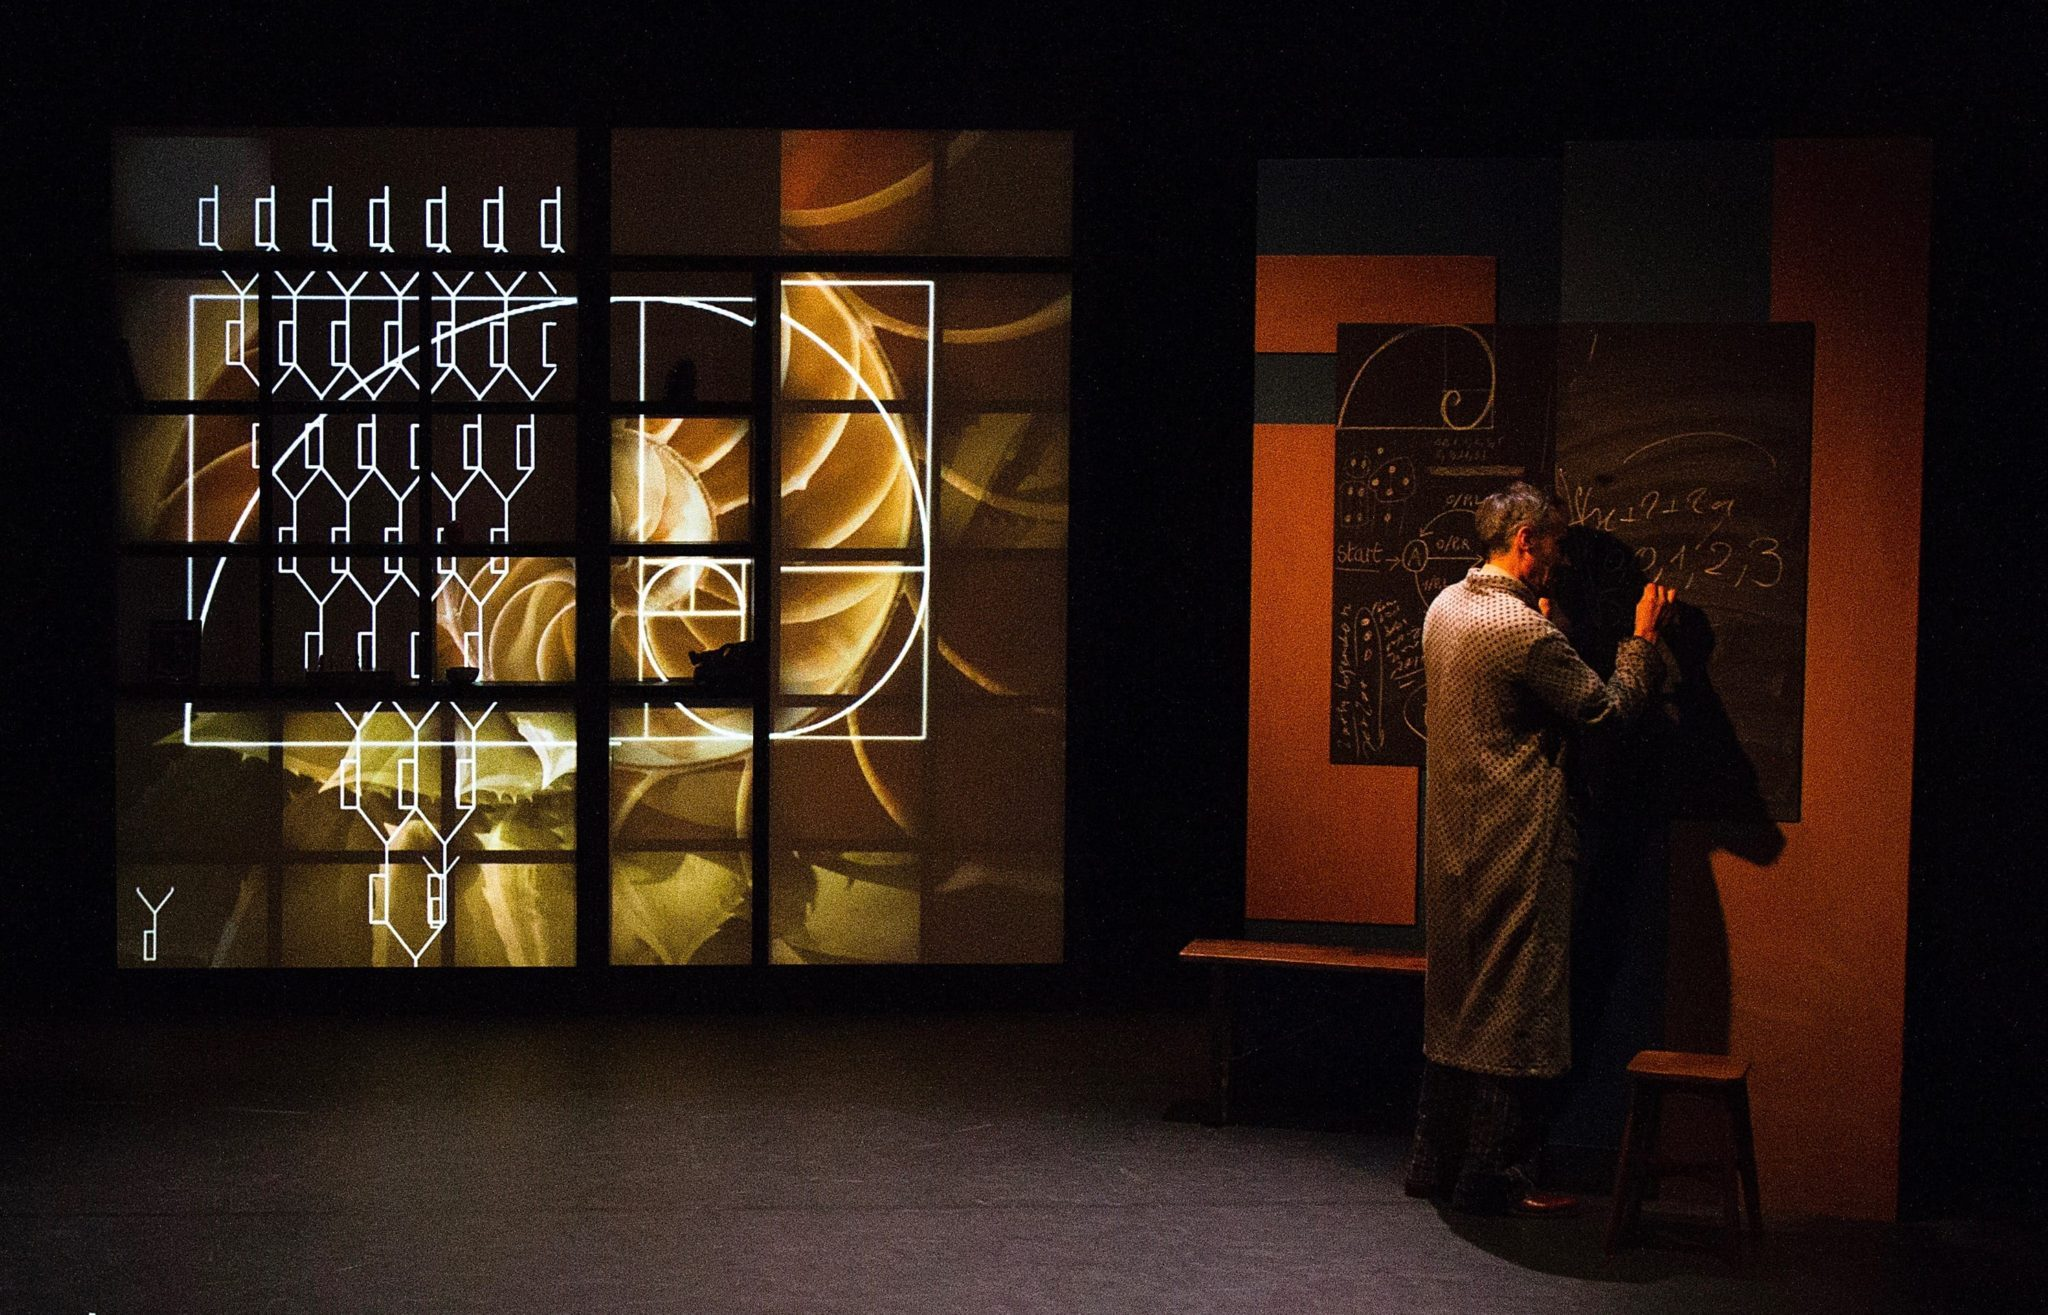 La Machine de Turing par Tristan Petitgirard photo 1